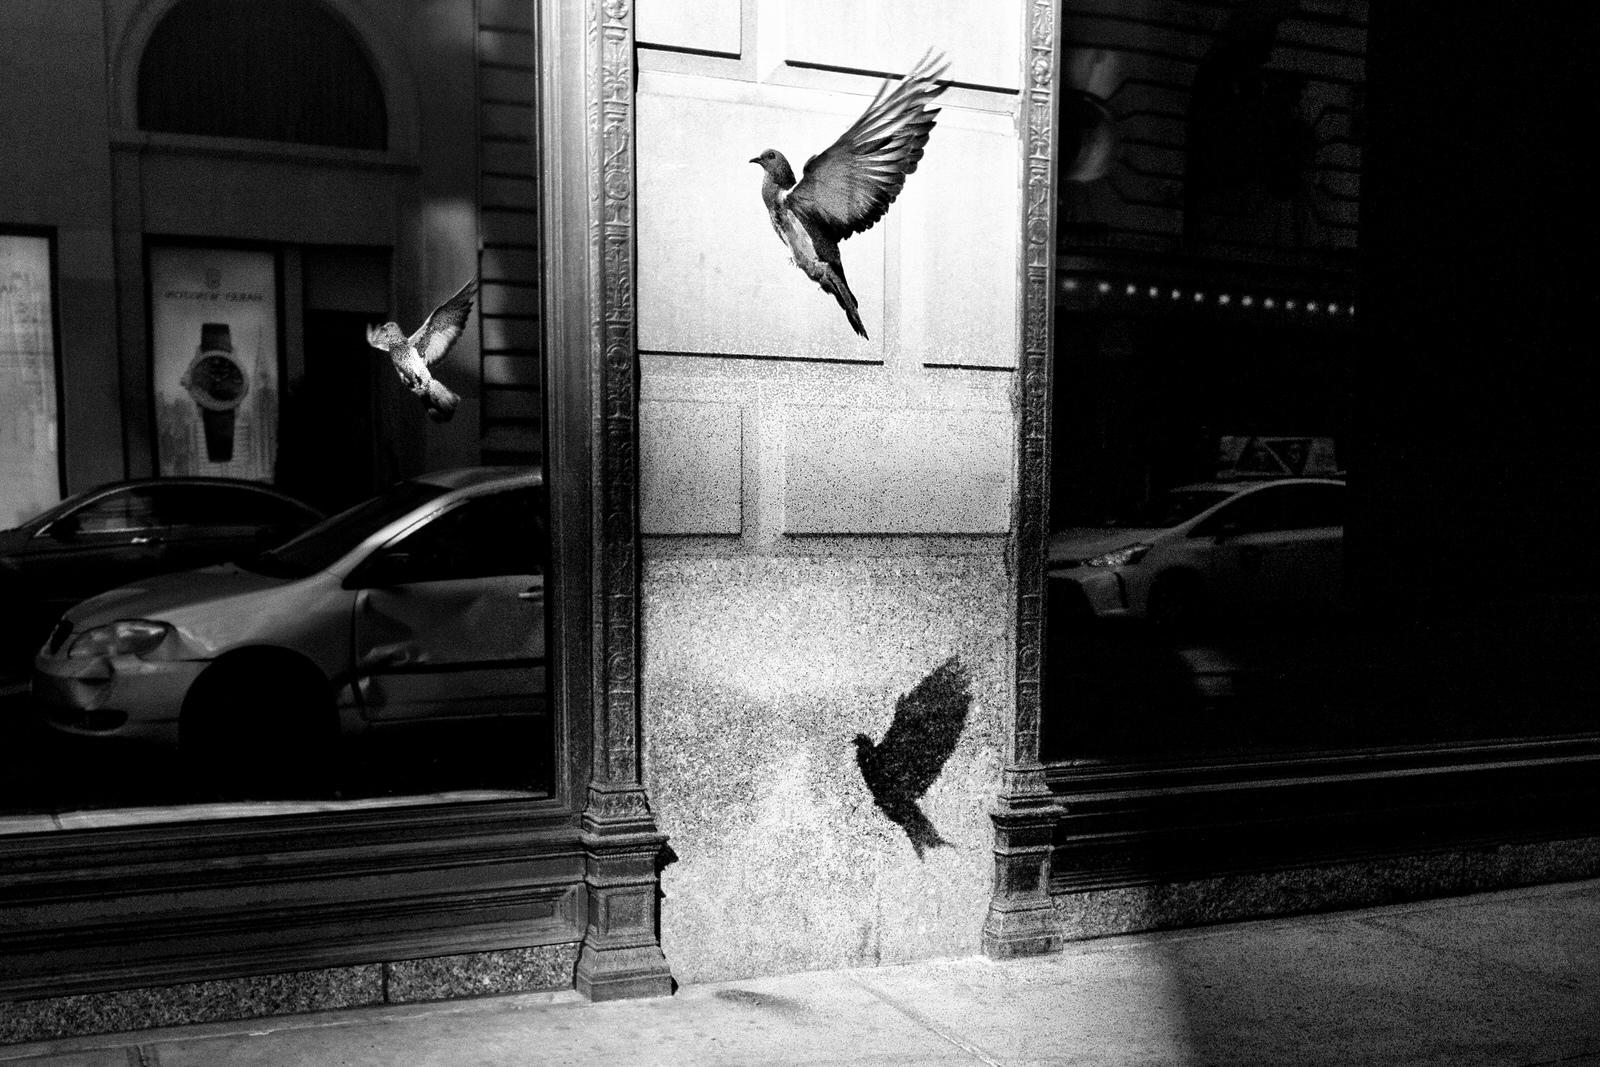 Pigeon Series - Alan Schaller - 1.jpg